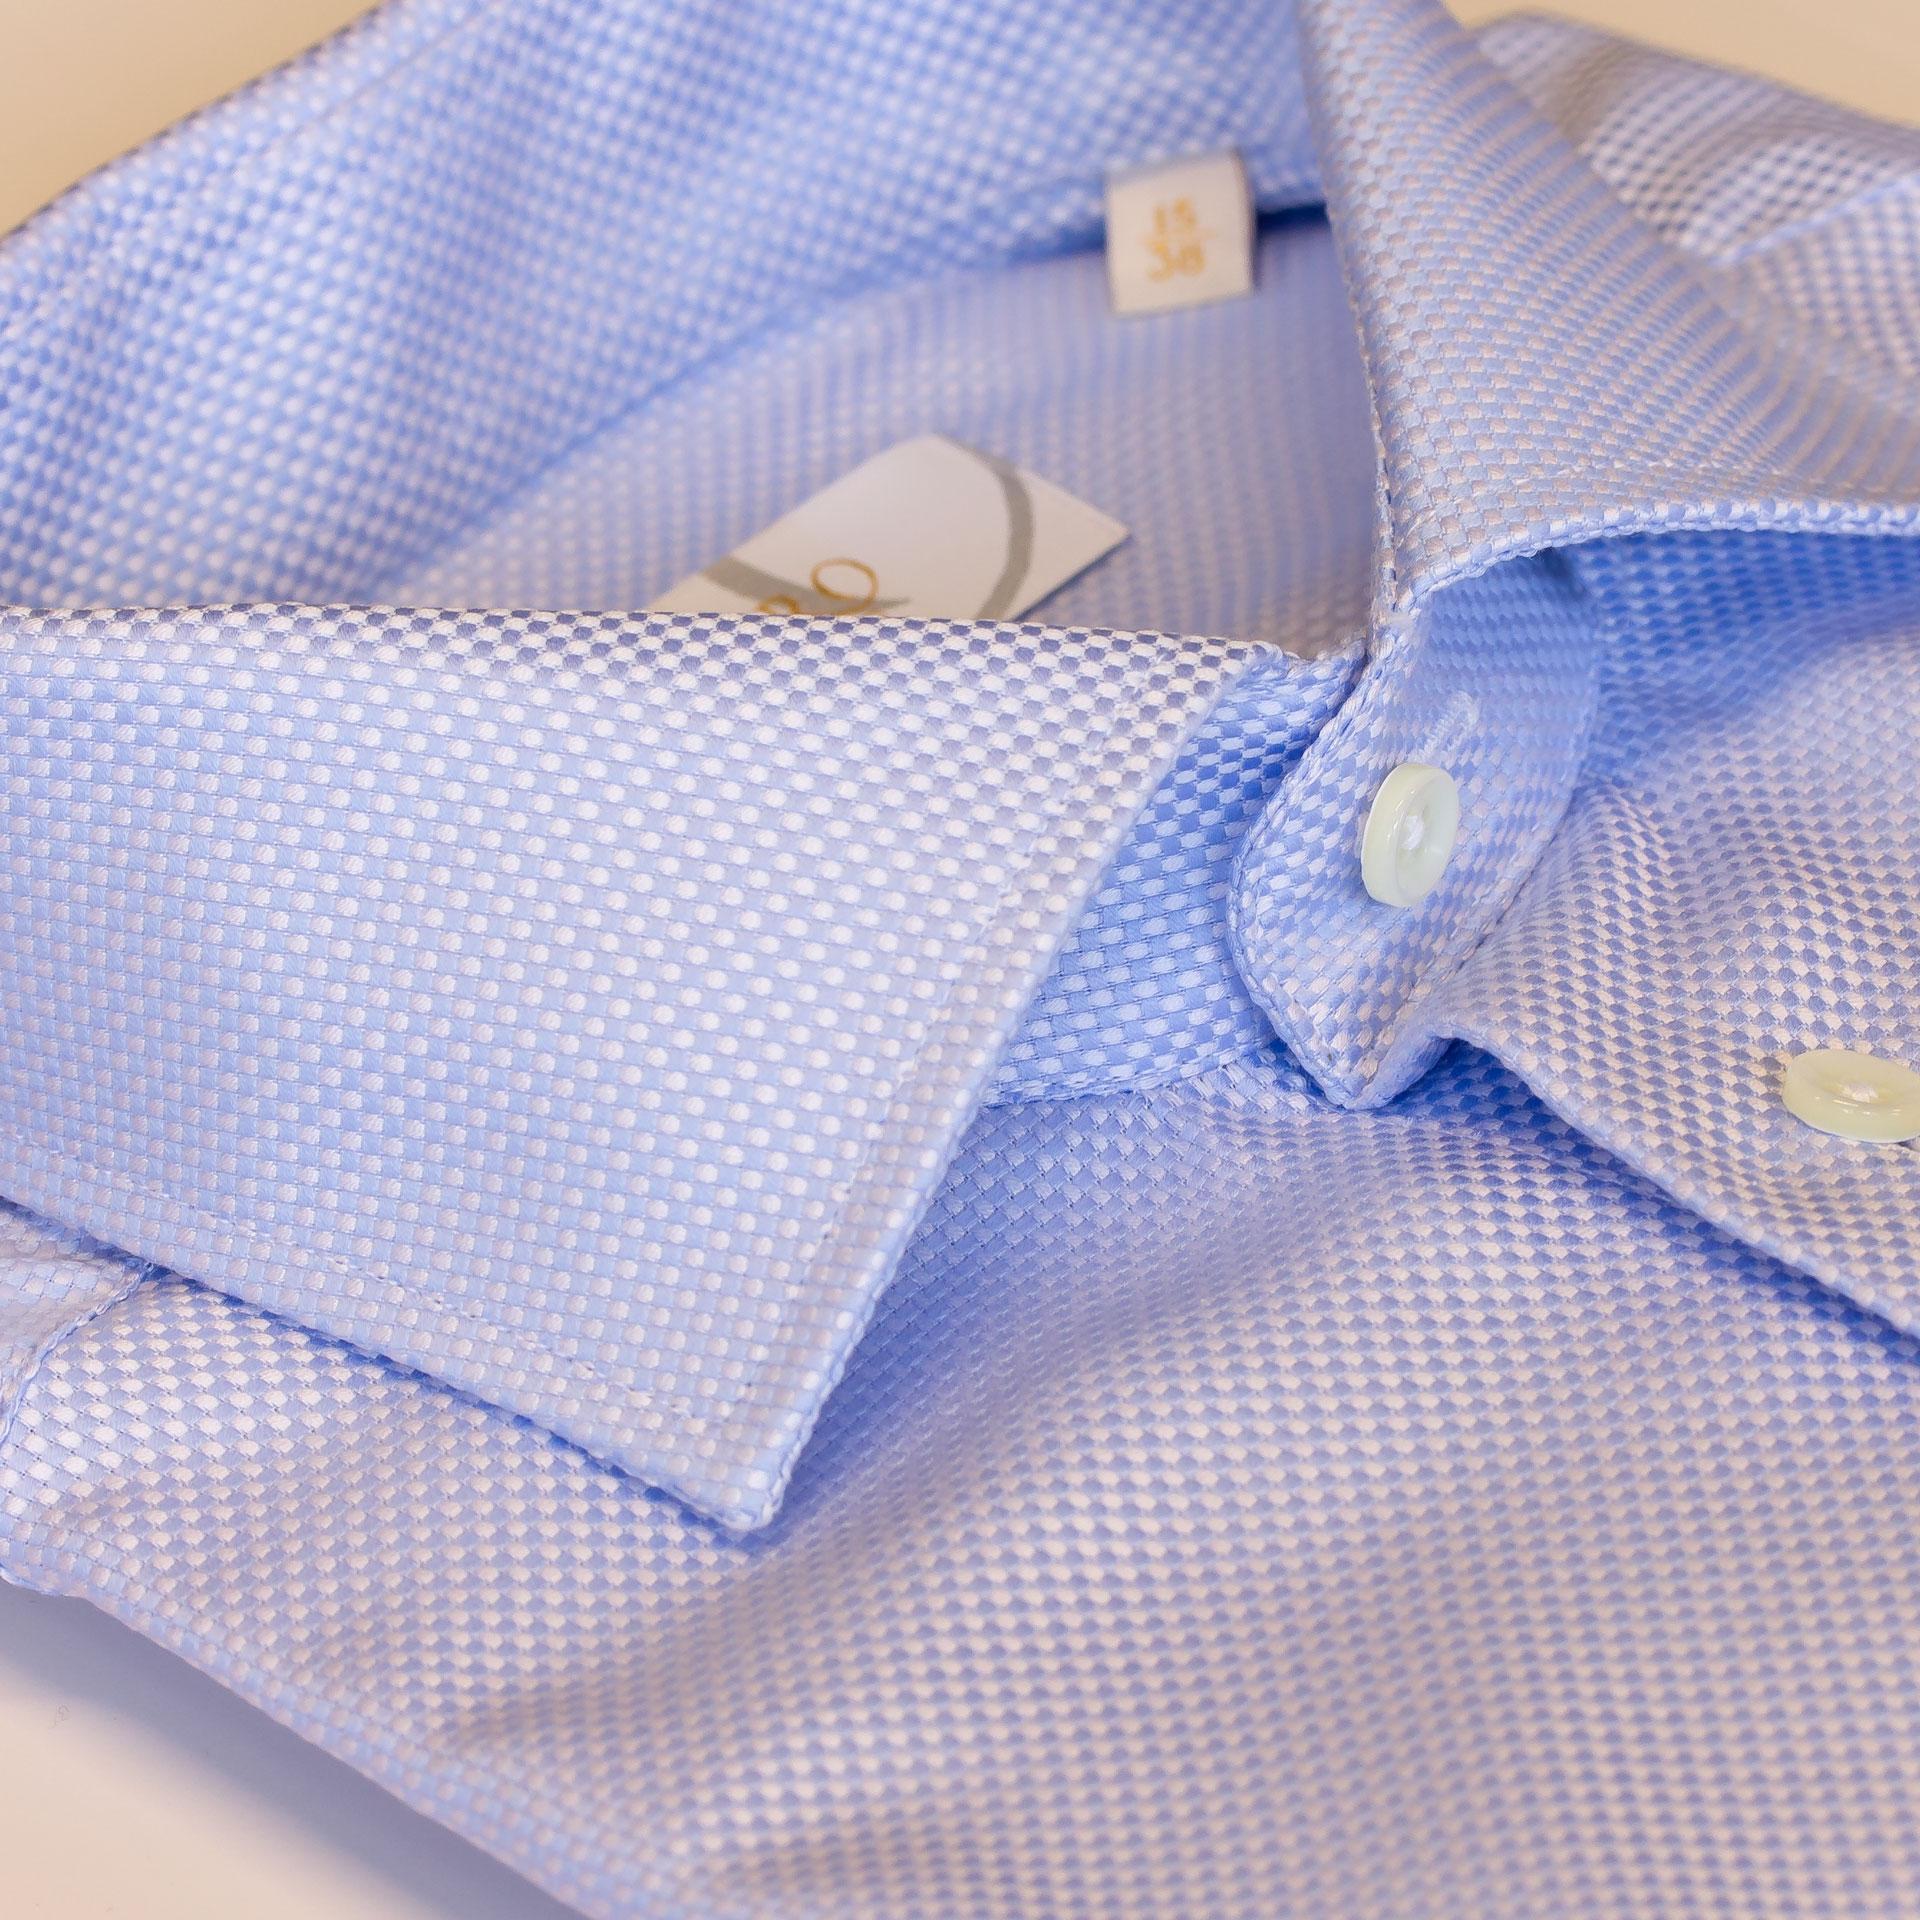 Smokingskjorte, klassisk krage i slimfit modell fra Viero Milano